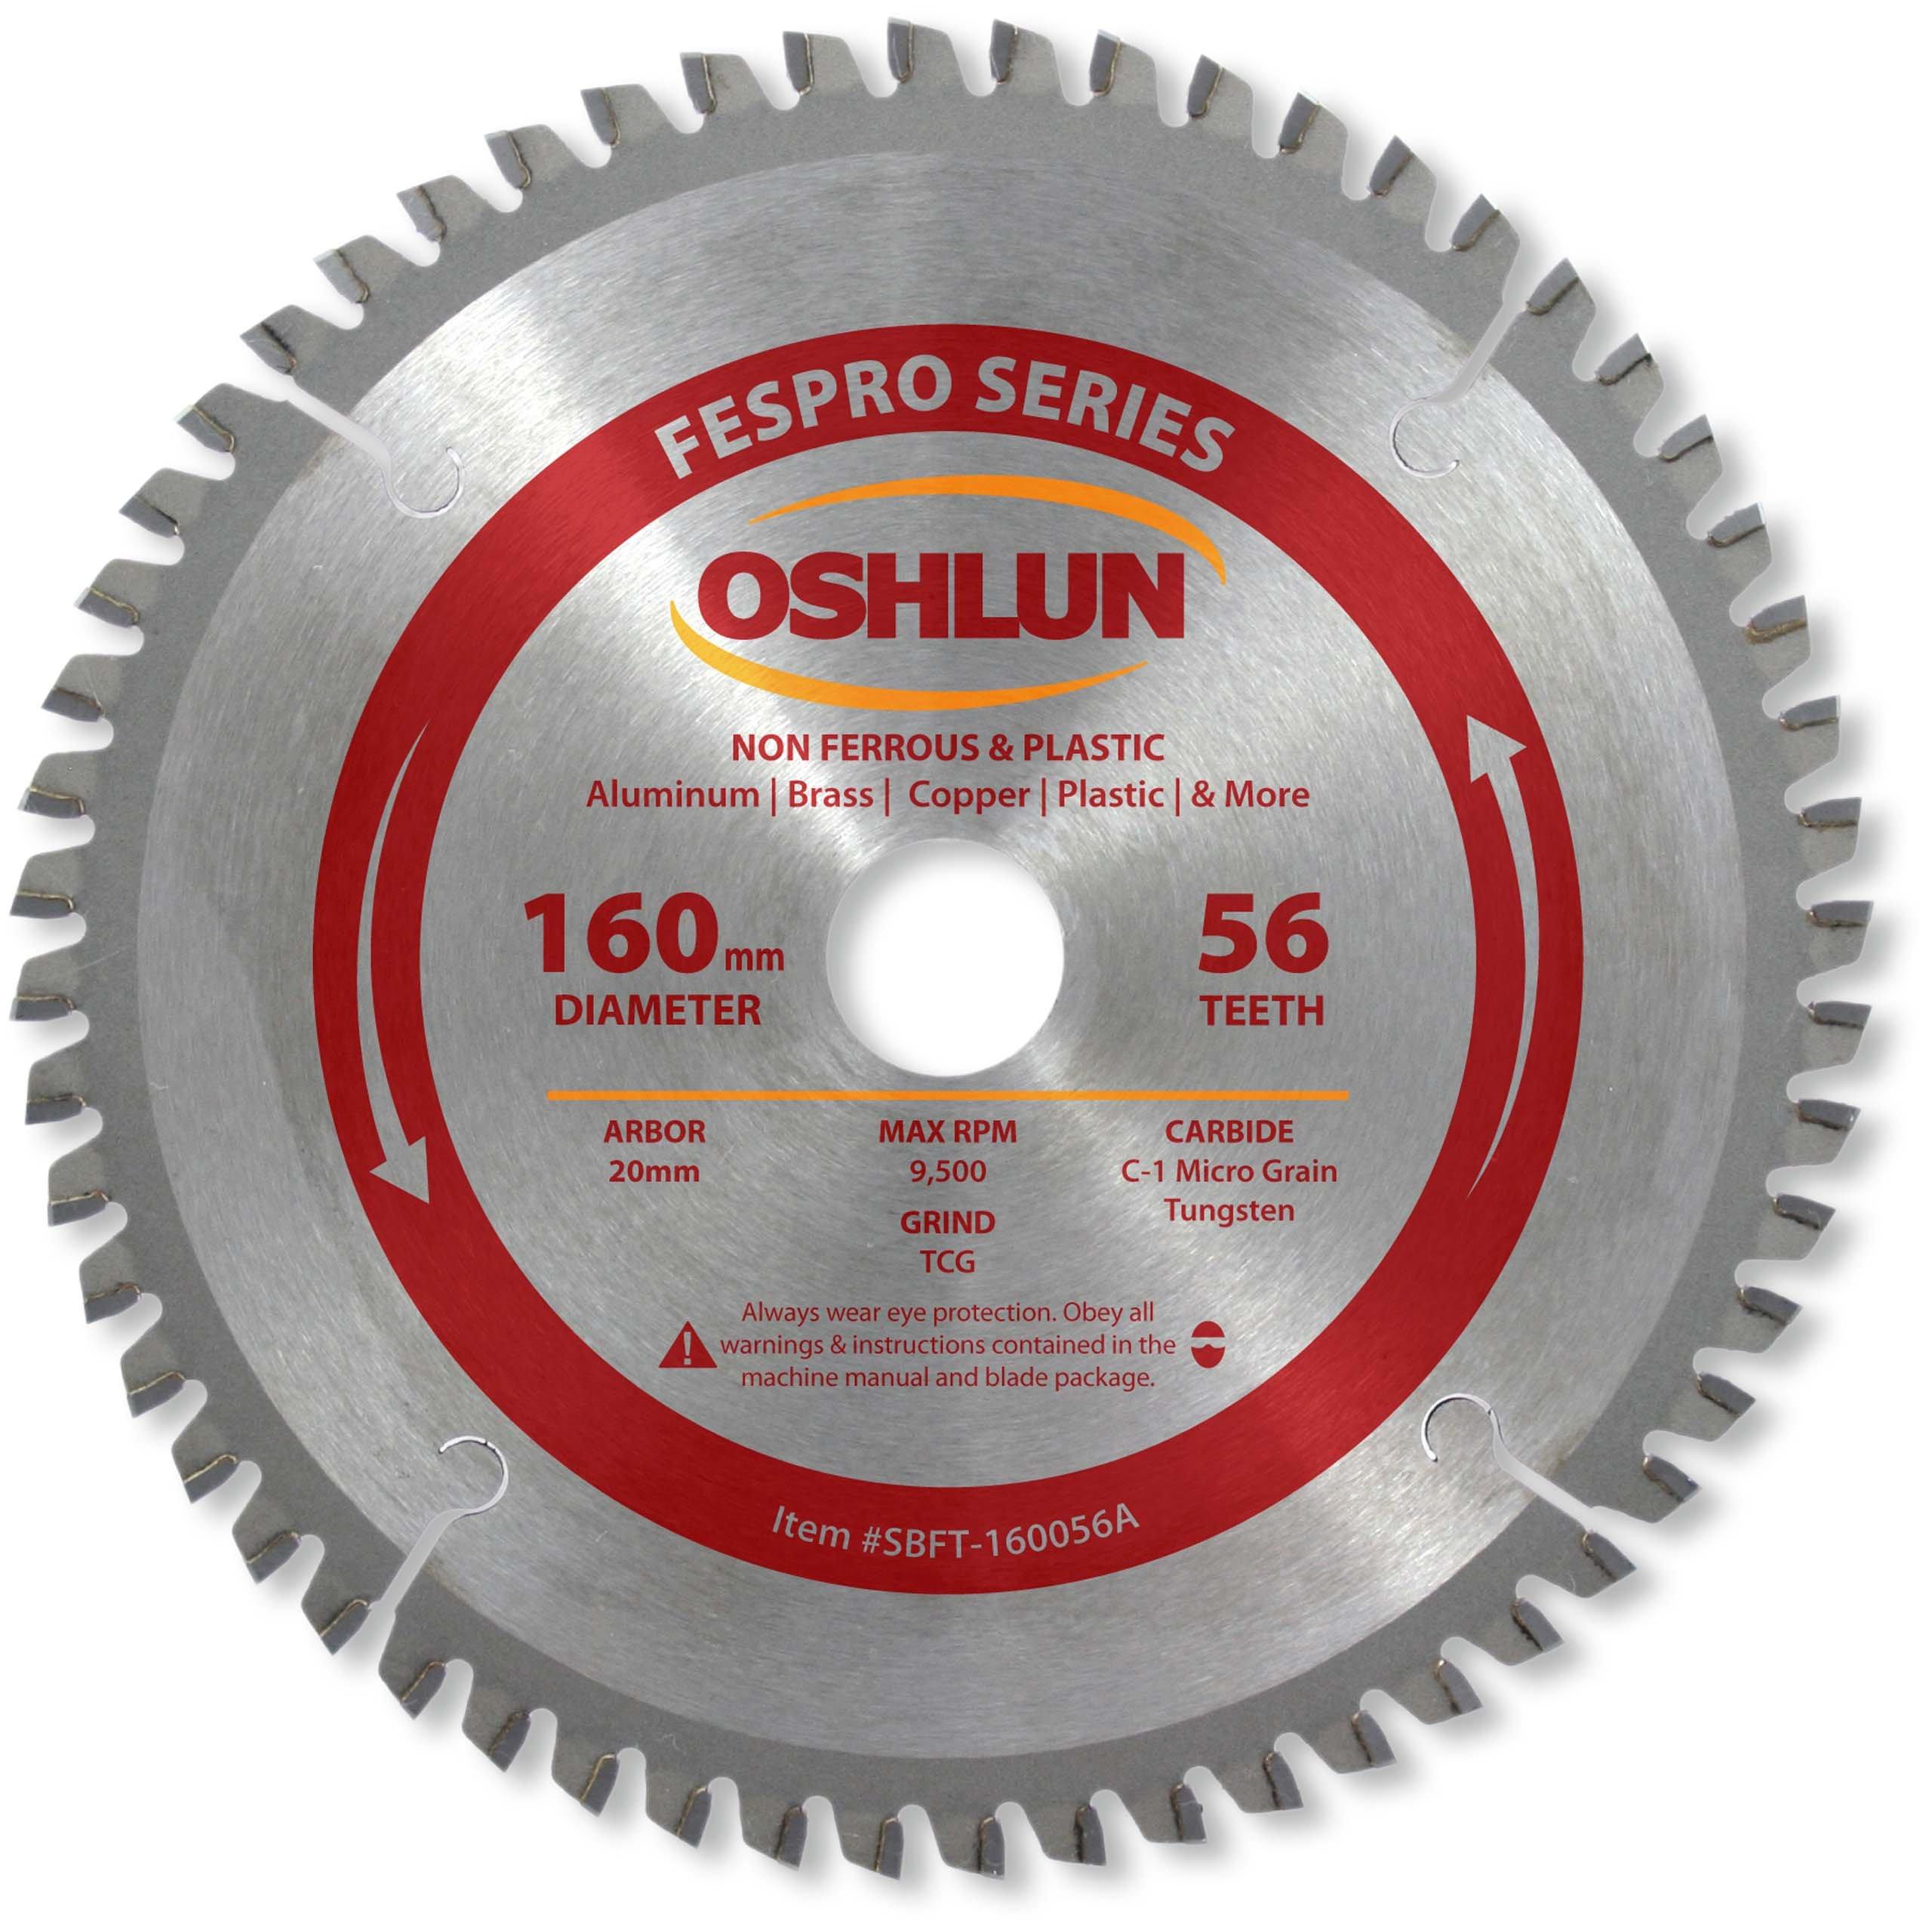 Disco Sierra OSHLUN SBFT 160056A 160mm 56T FesPro TCG no f